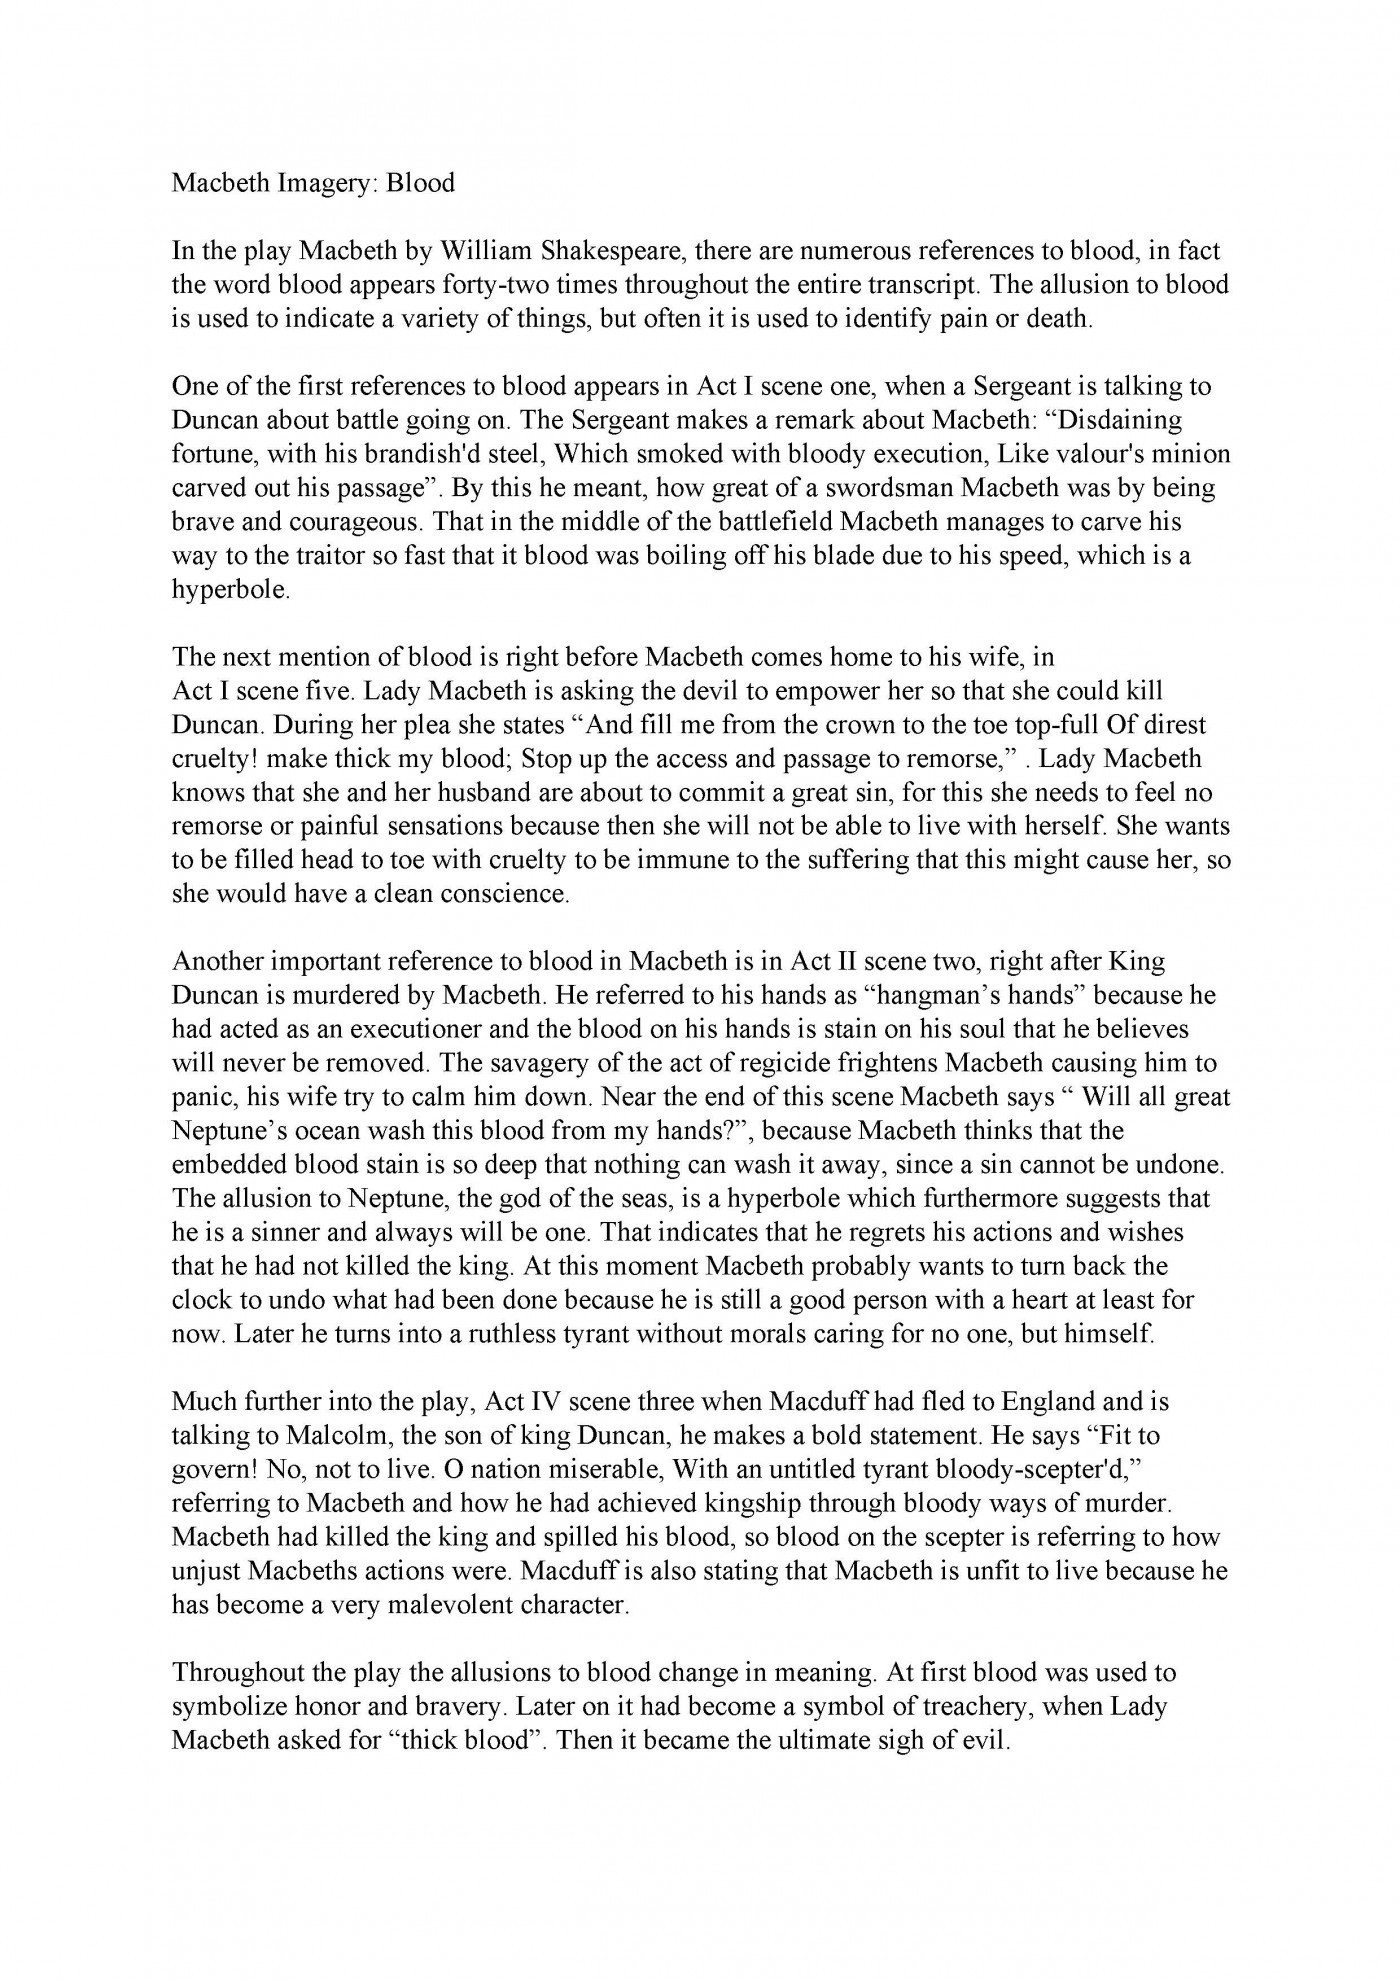 002 Macbeth Essay Sample Impressive Example Good About Yourself Examples Pdf Descriptive 1400